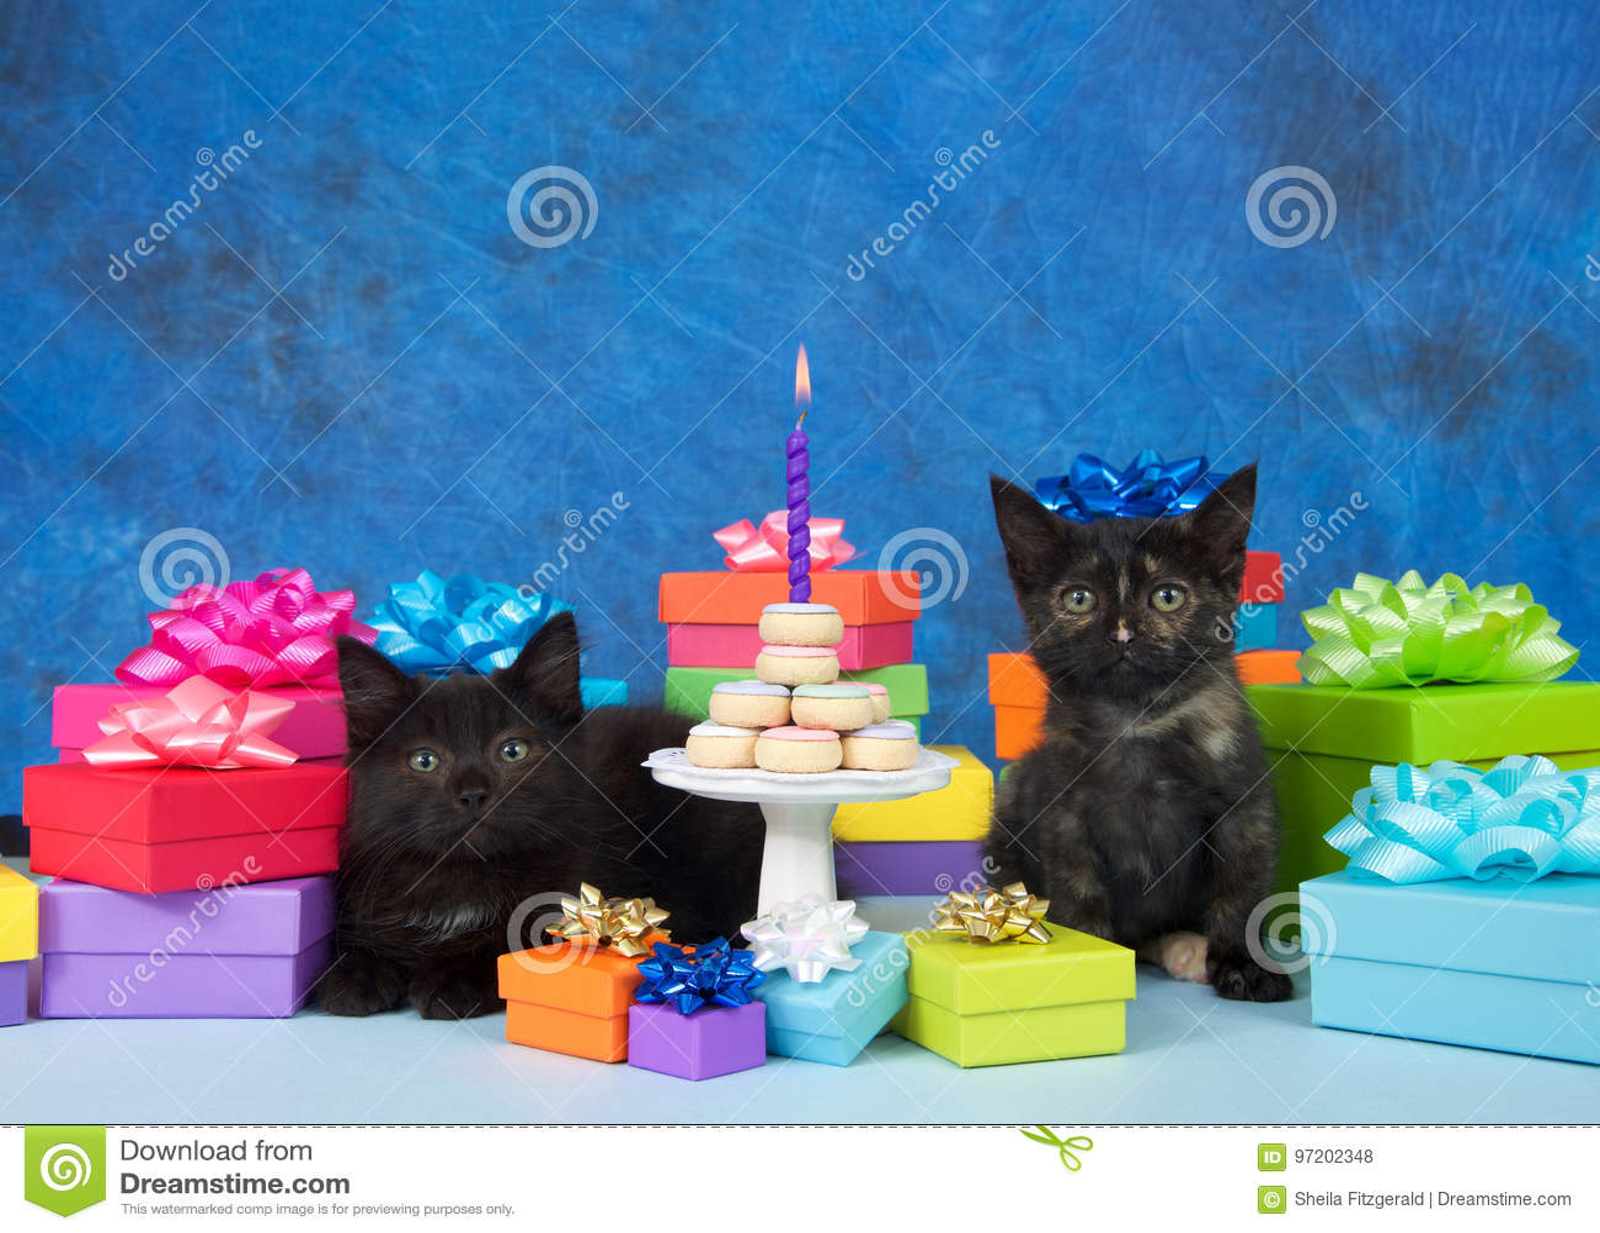 Kittens Birthday Party Miniature Donut Cake Stock Photo Image Of